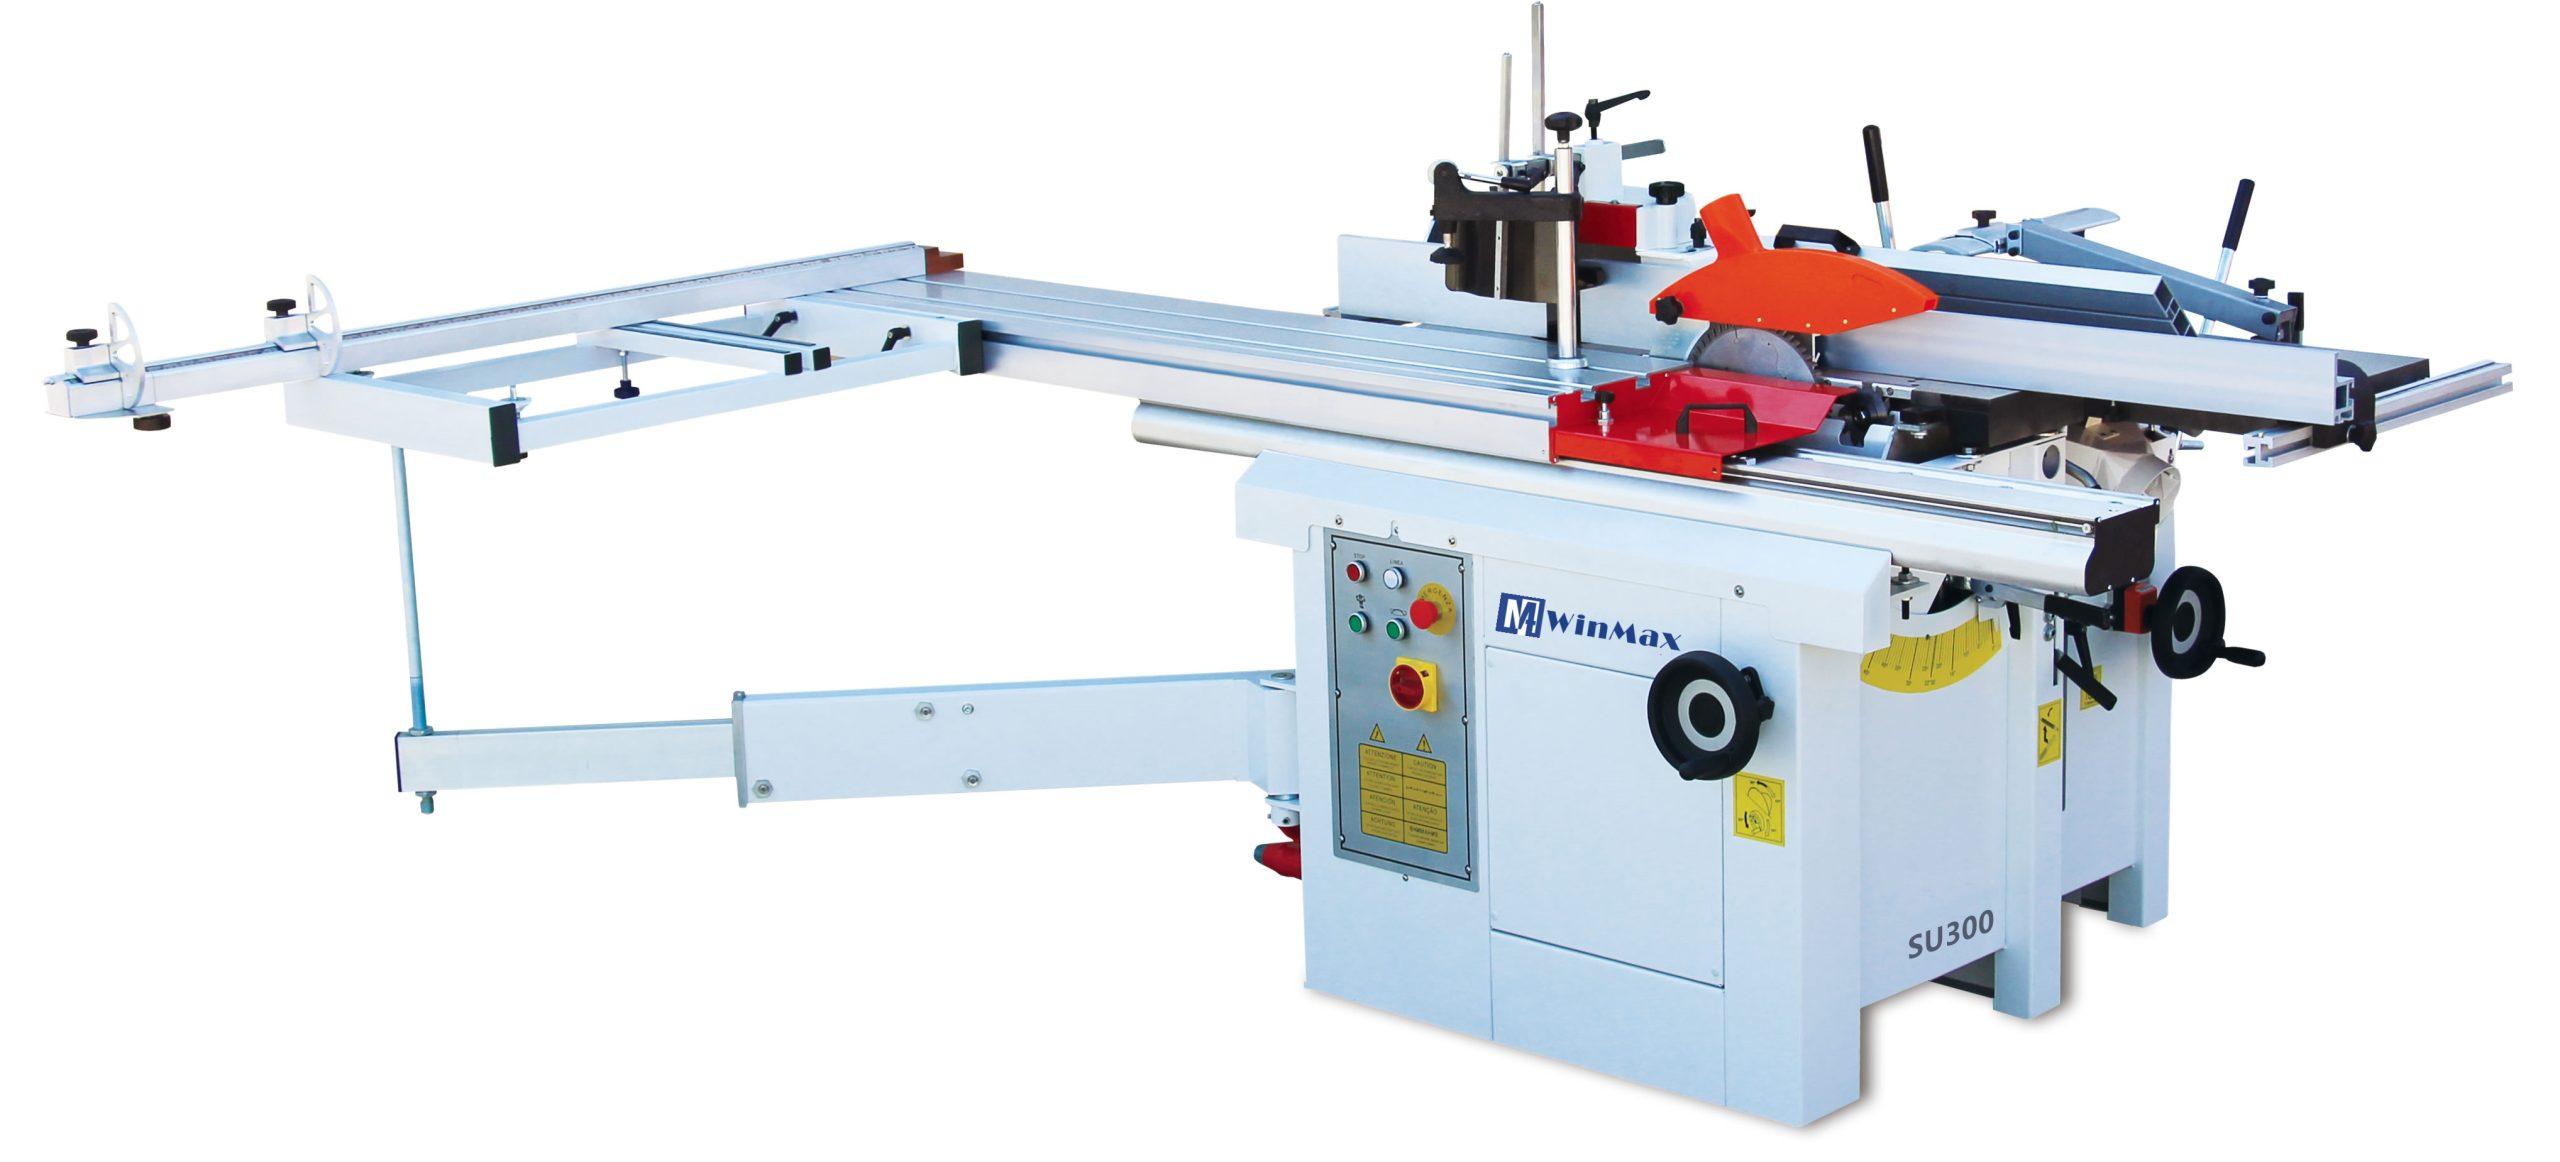 Make a woodworking machine with Winamx